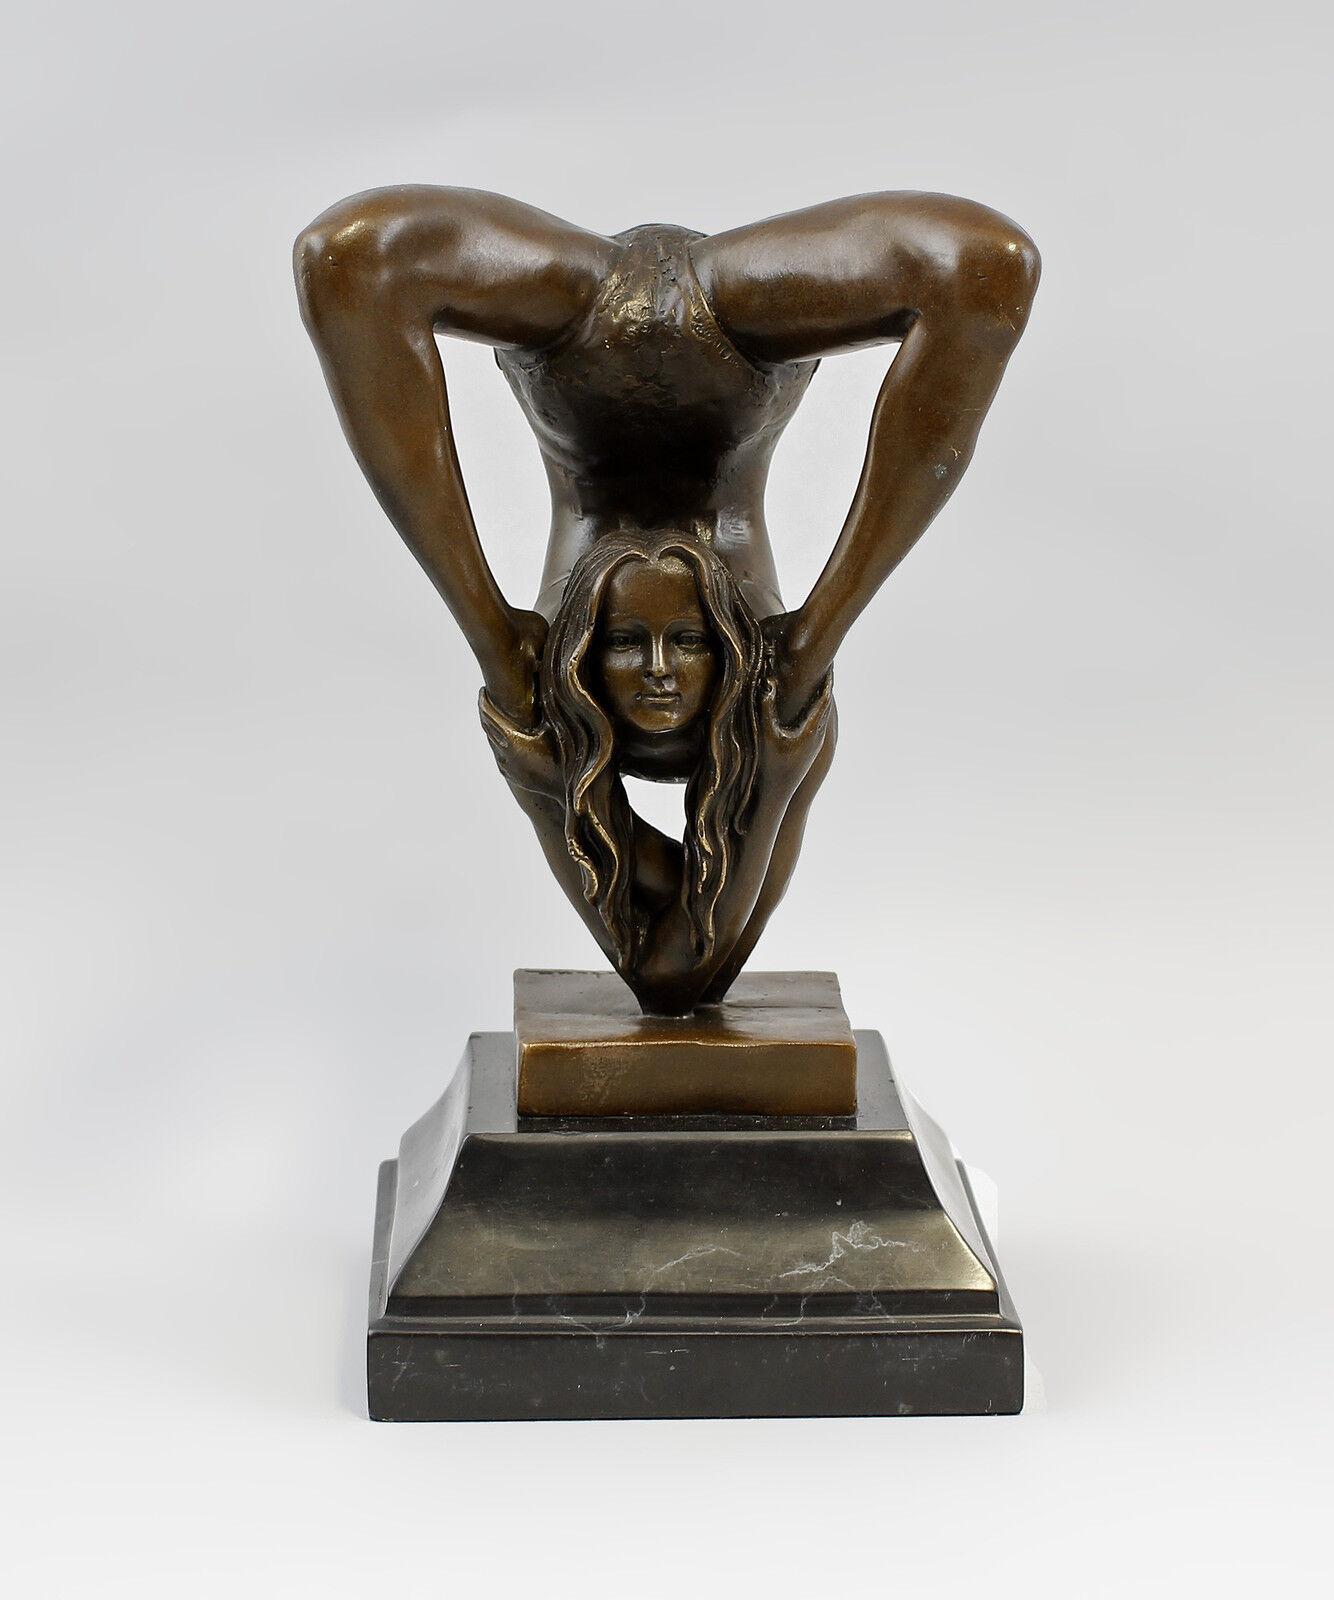 Skulptur Bronze Plastik Patoue Gymnasiastin in Bikini 9937836